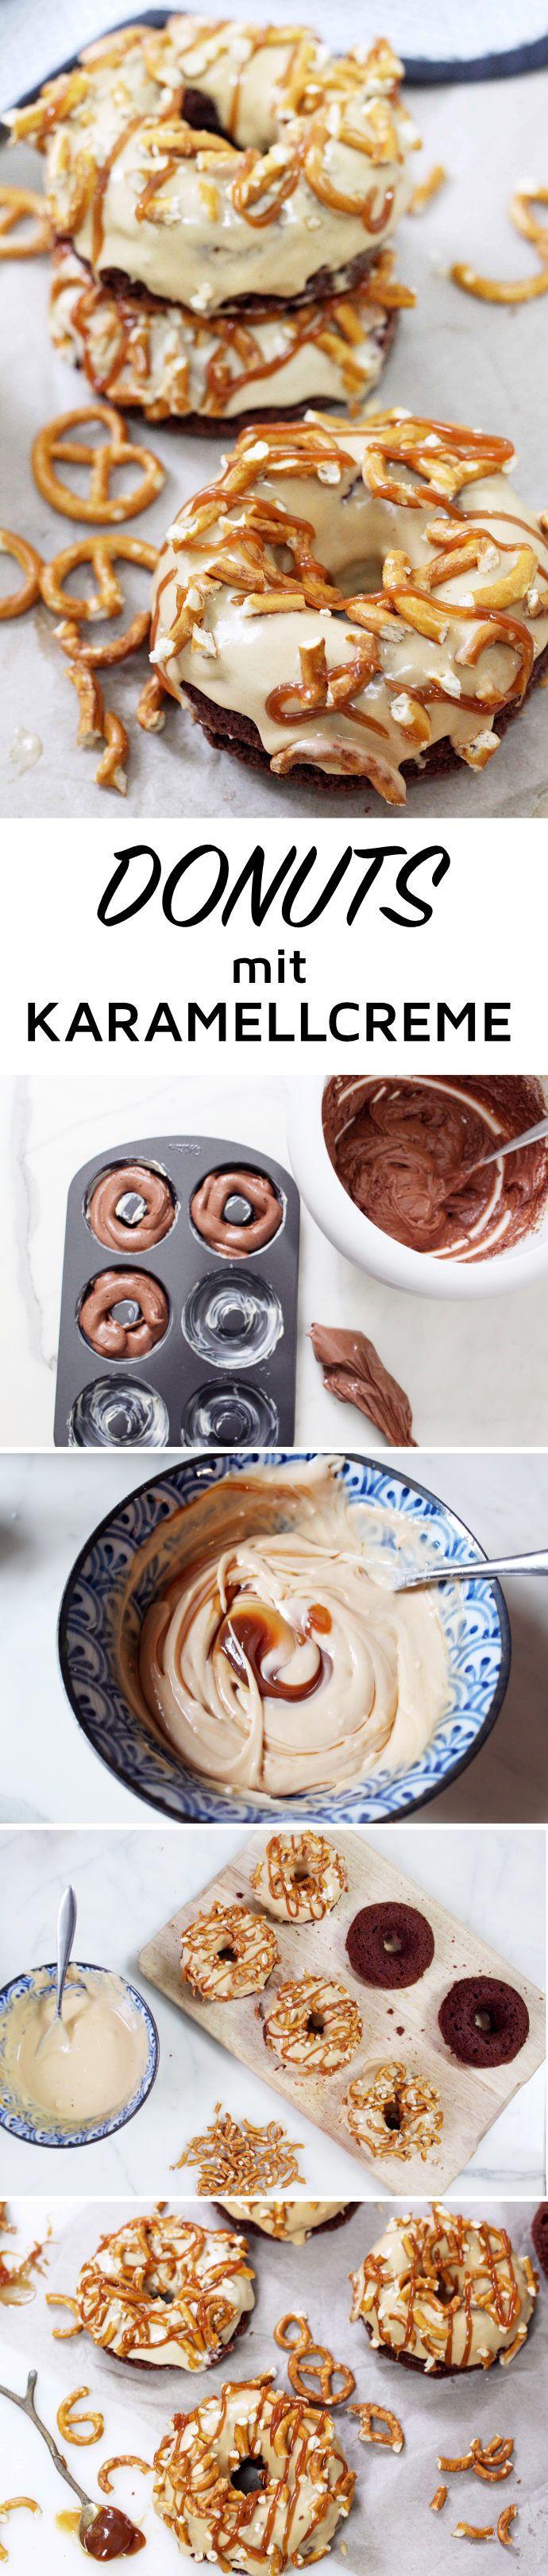 Schokoladen Donuts mit salziger Karamellcreme backen: DIY Rezept